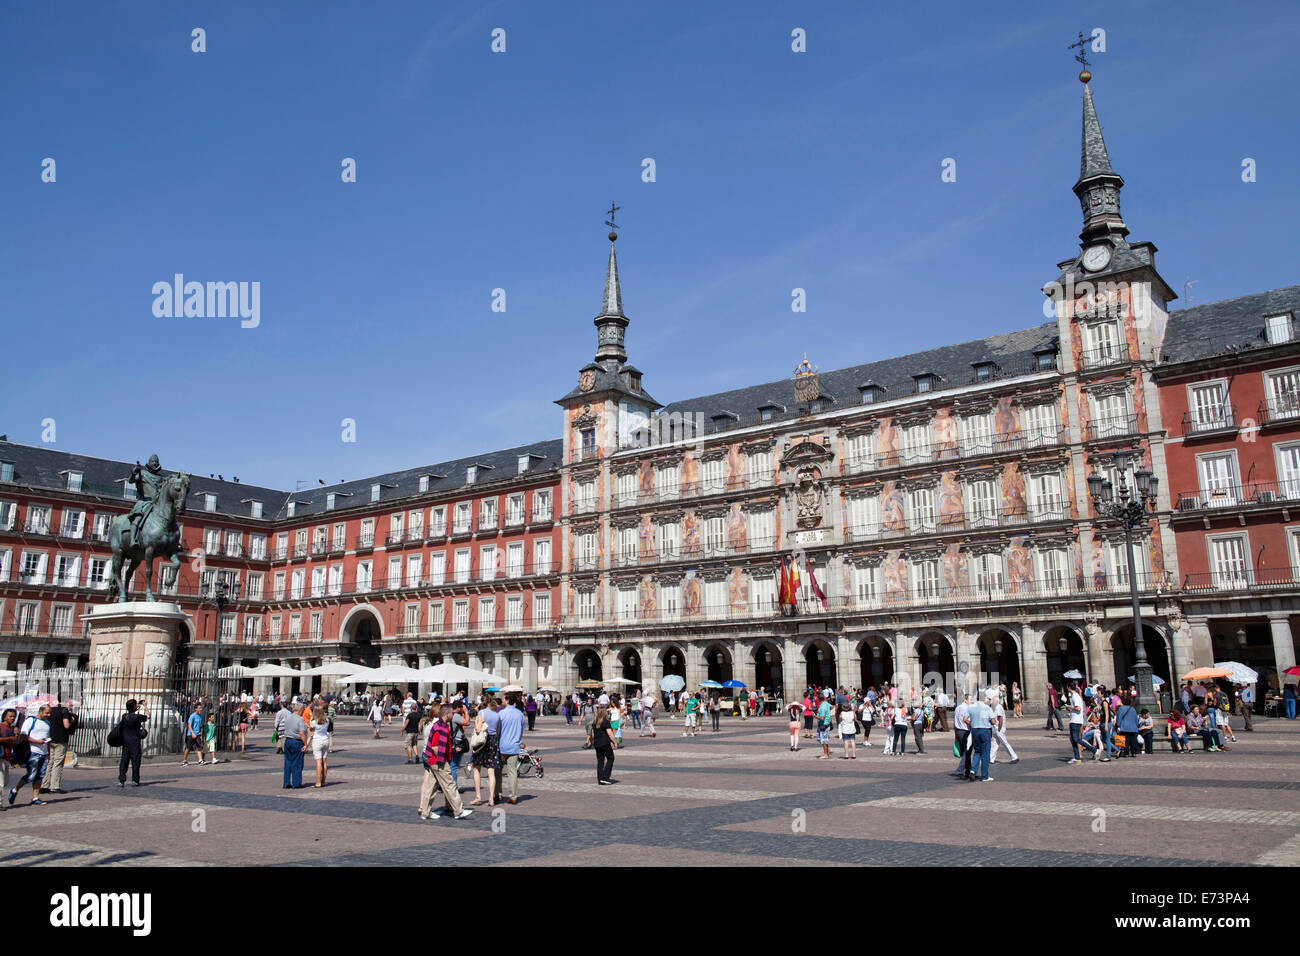 Spain, Madrid, Plaza Mayor. Stock Photo